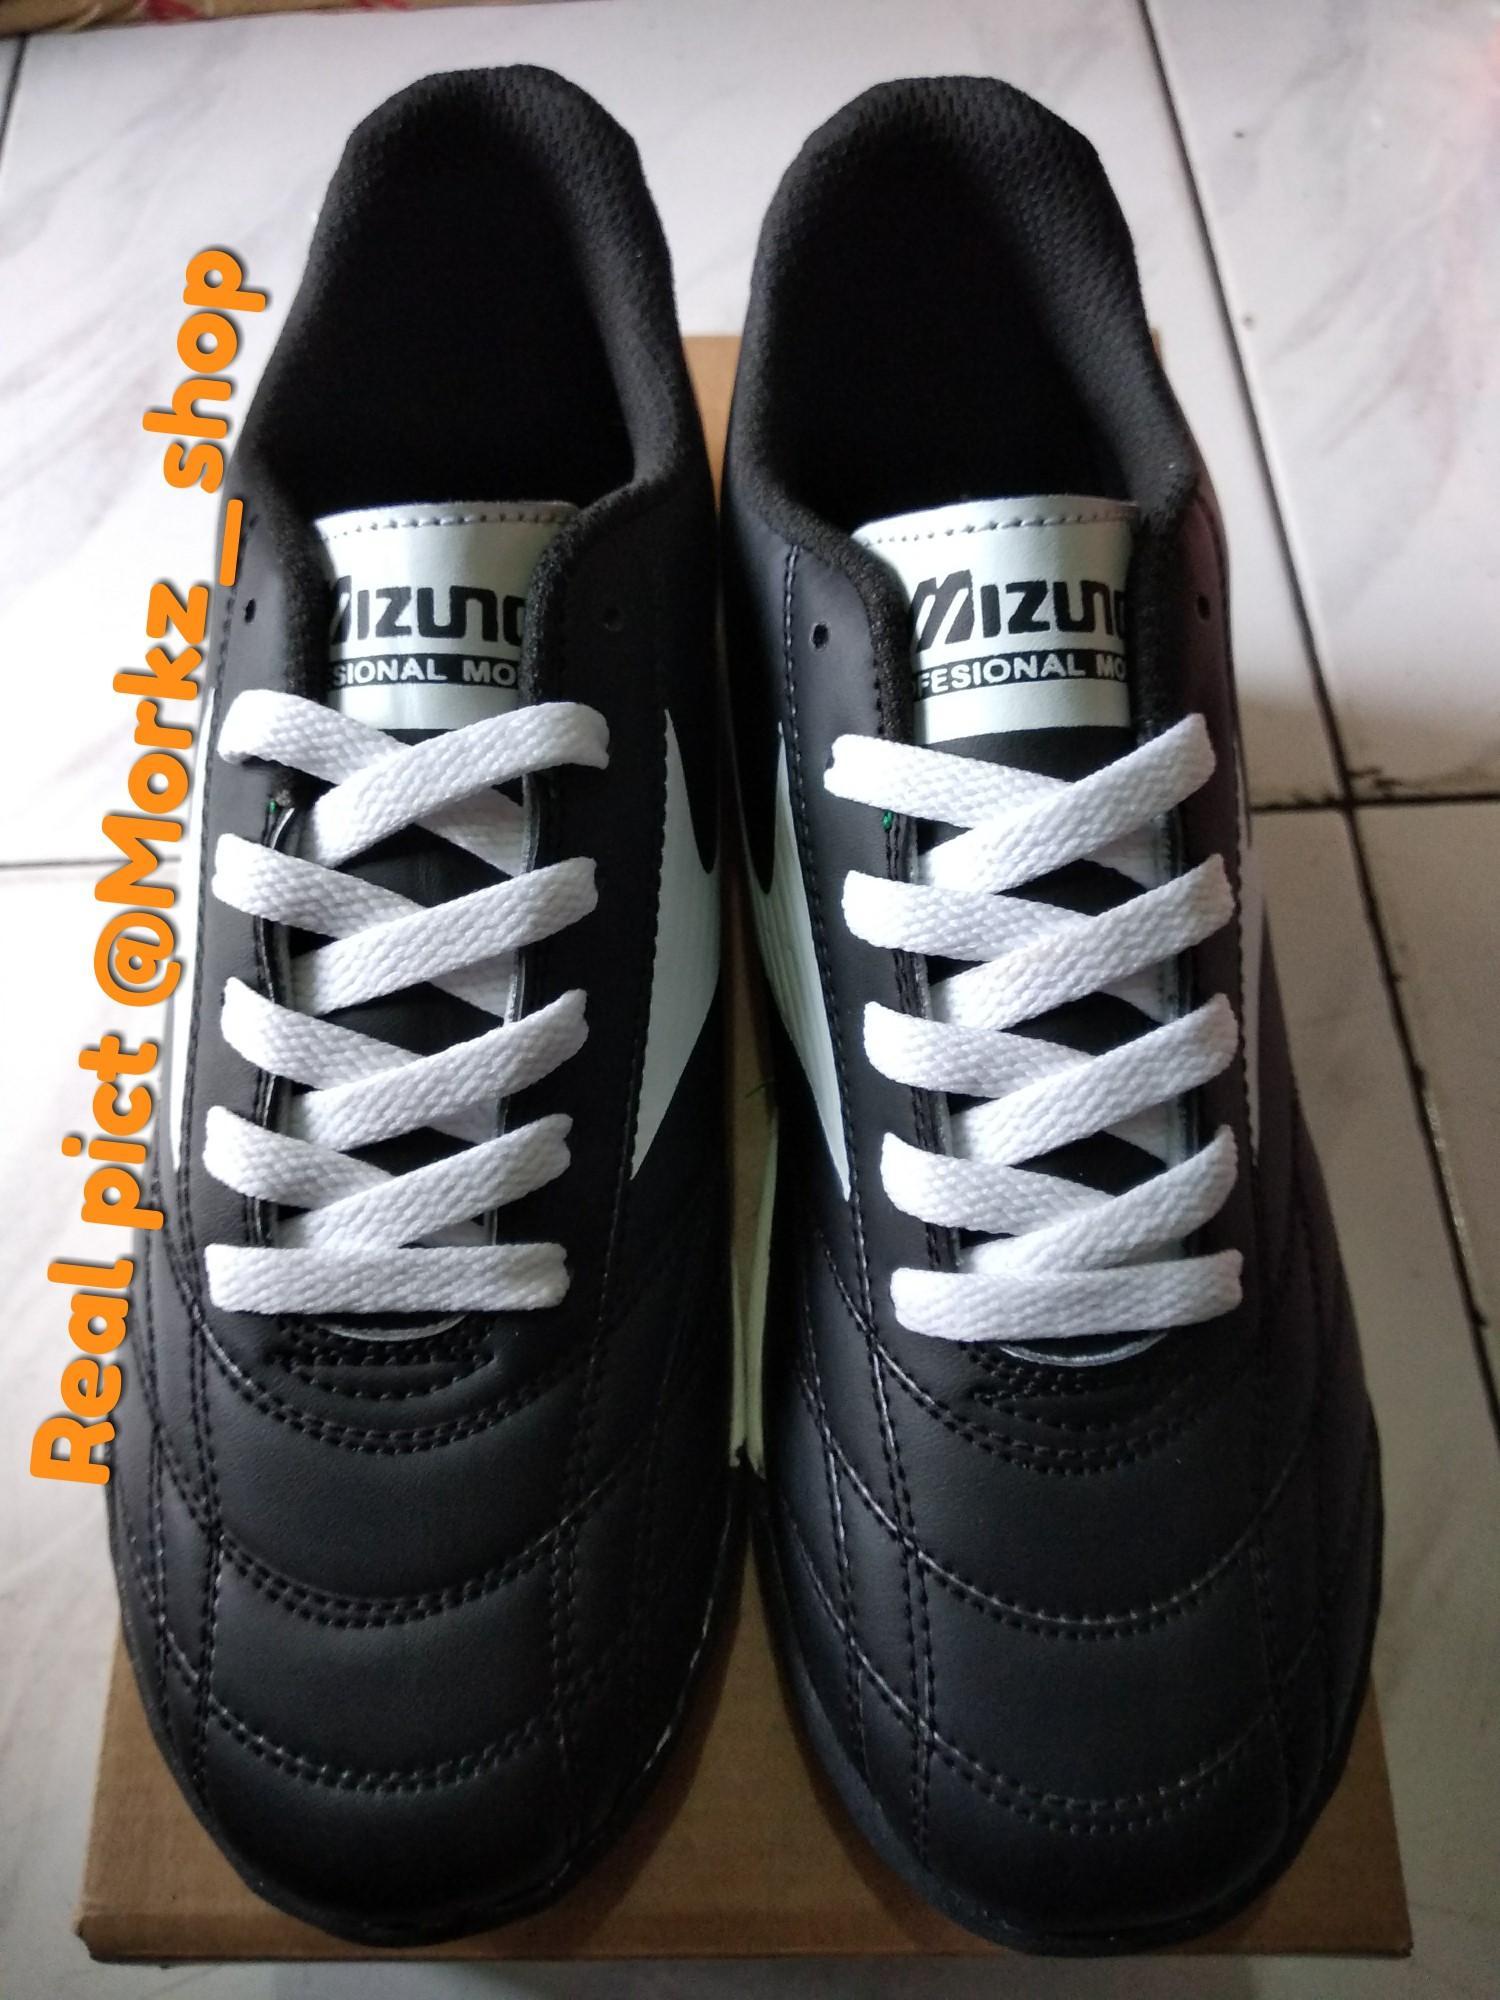 Harga Diskon Sepatu Futsal Mizuno Murah Dan High Quality Spesifikasi ... ad0ab353c5